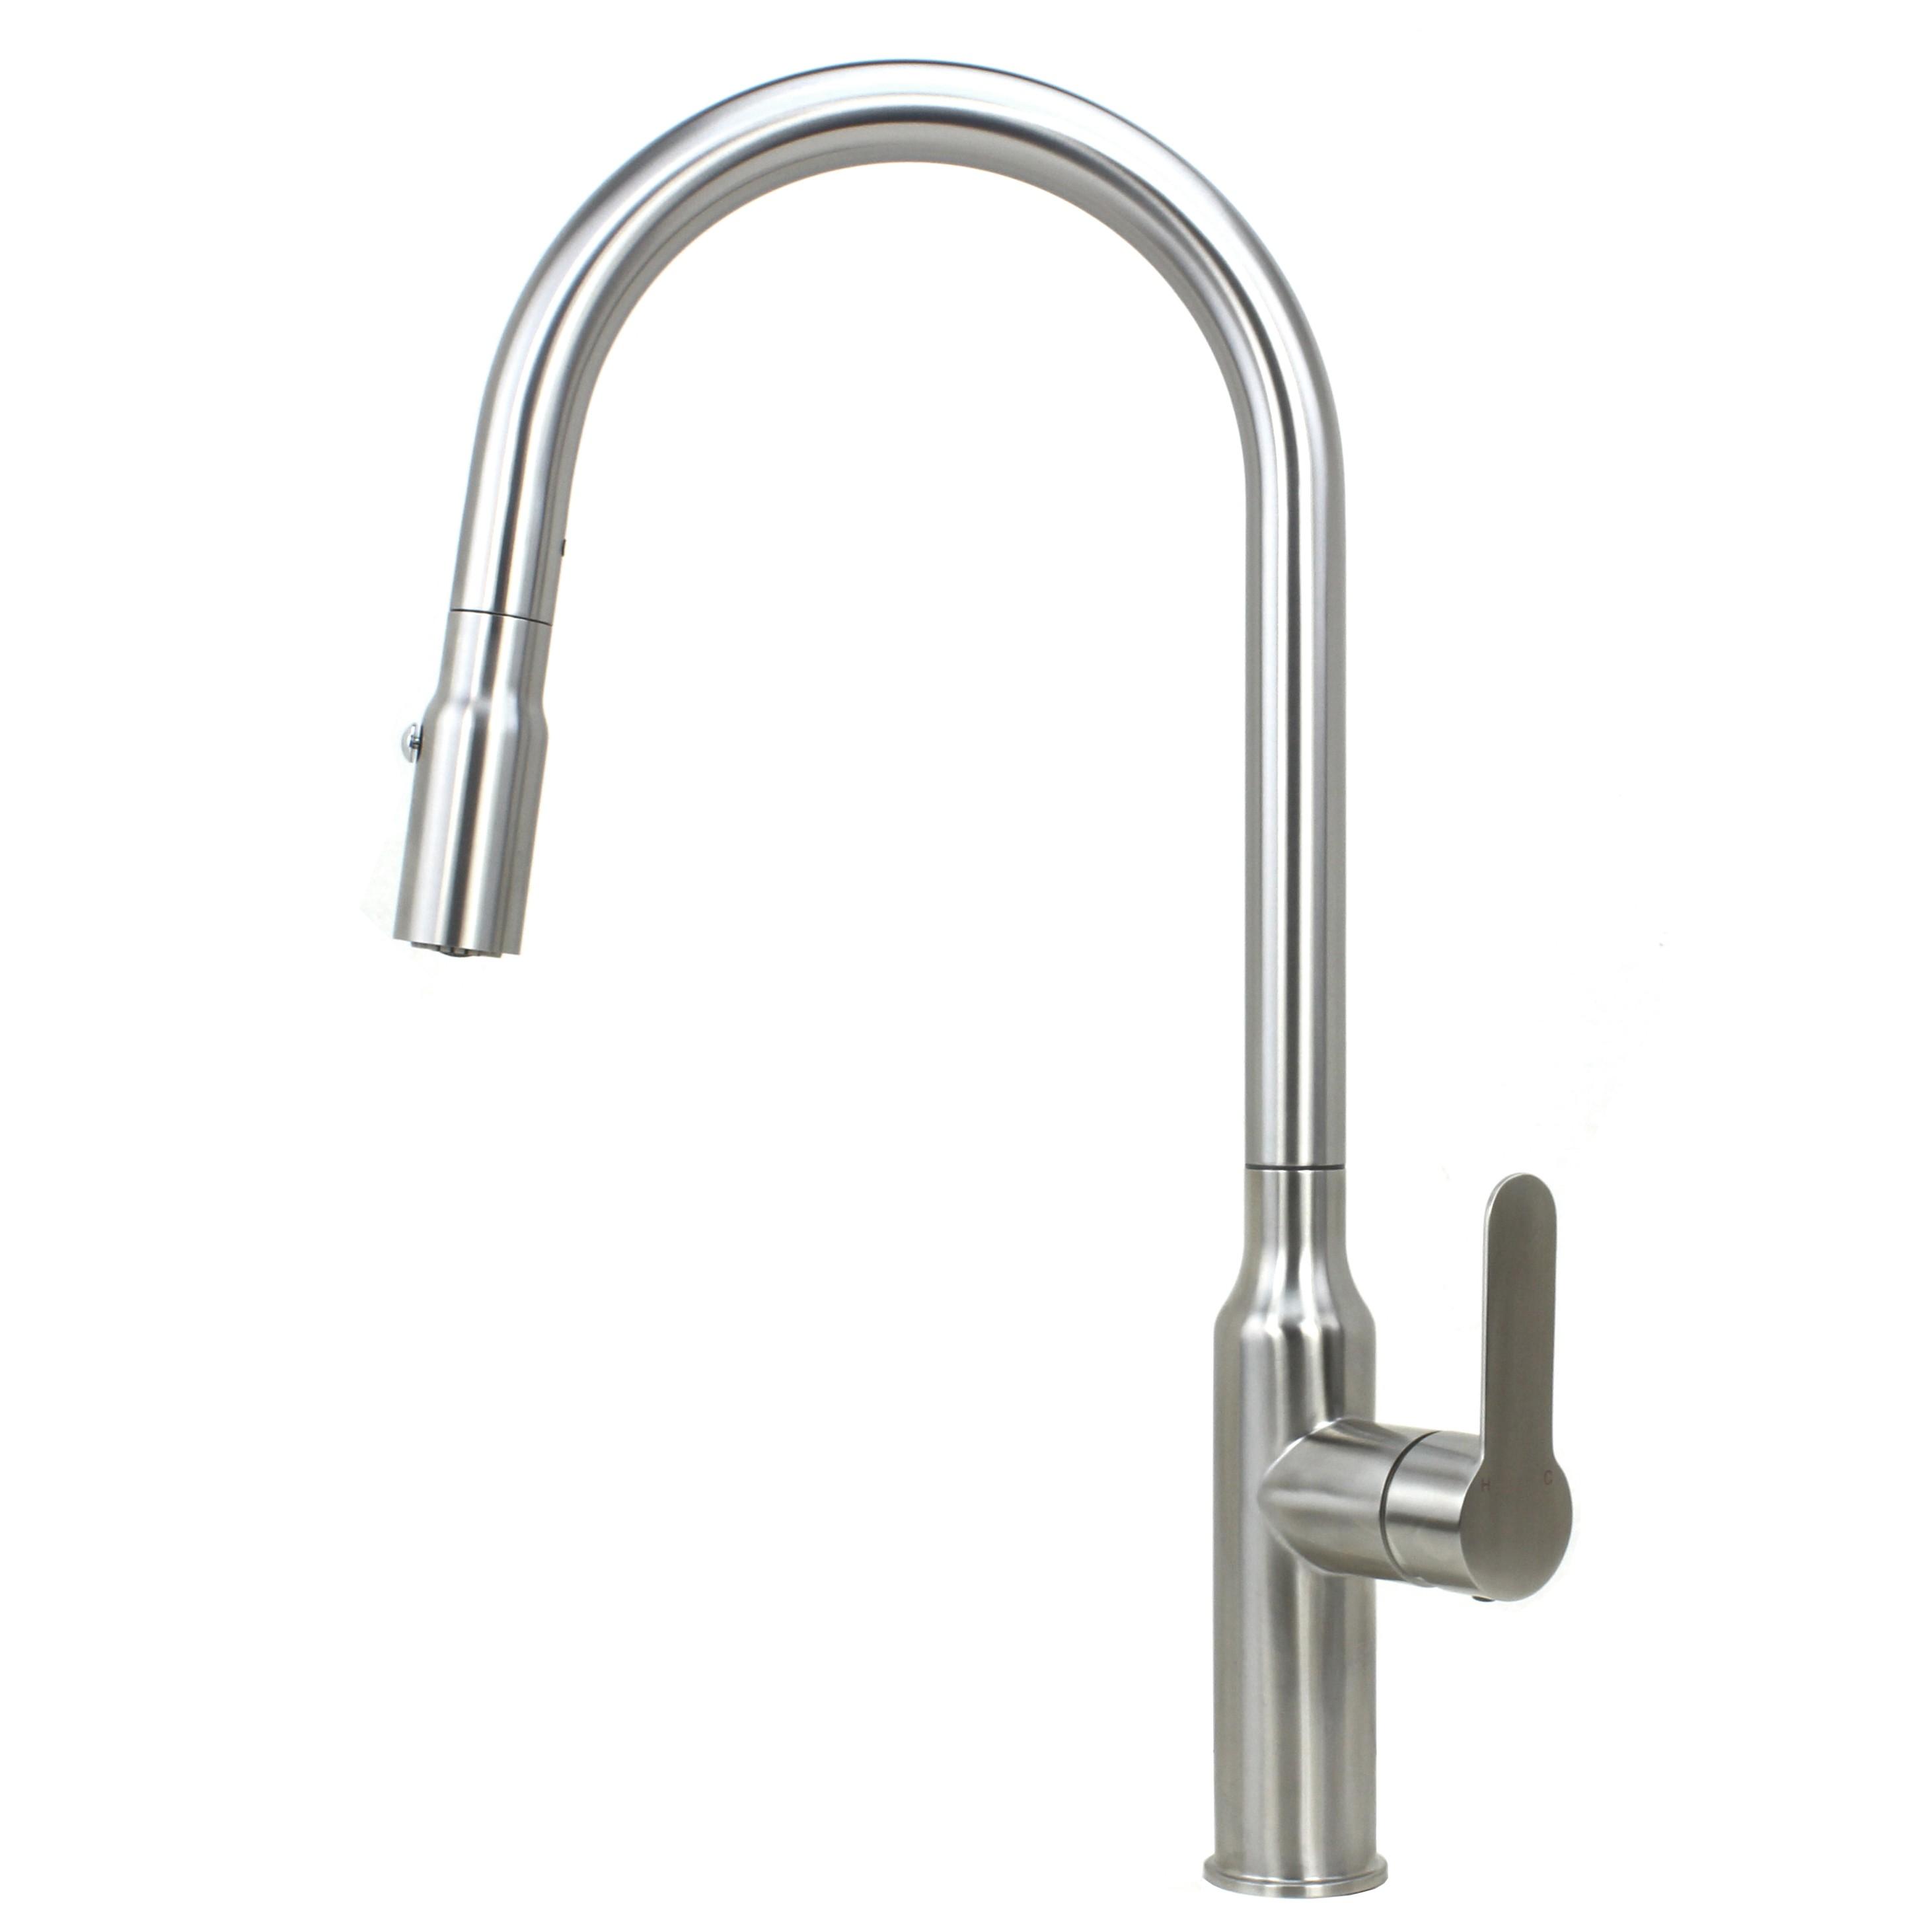 Ariel Flute Stainless Steel Lead Free Single Handle Pull